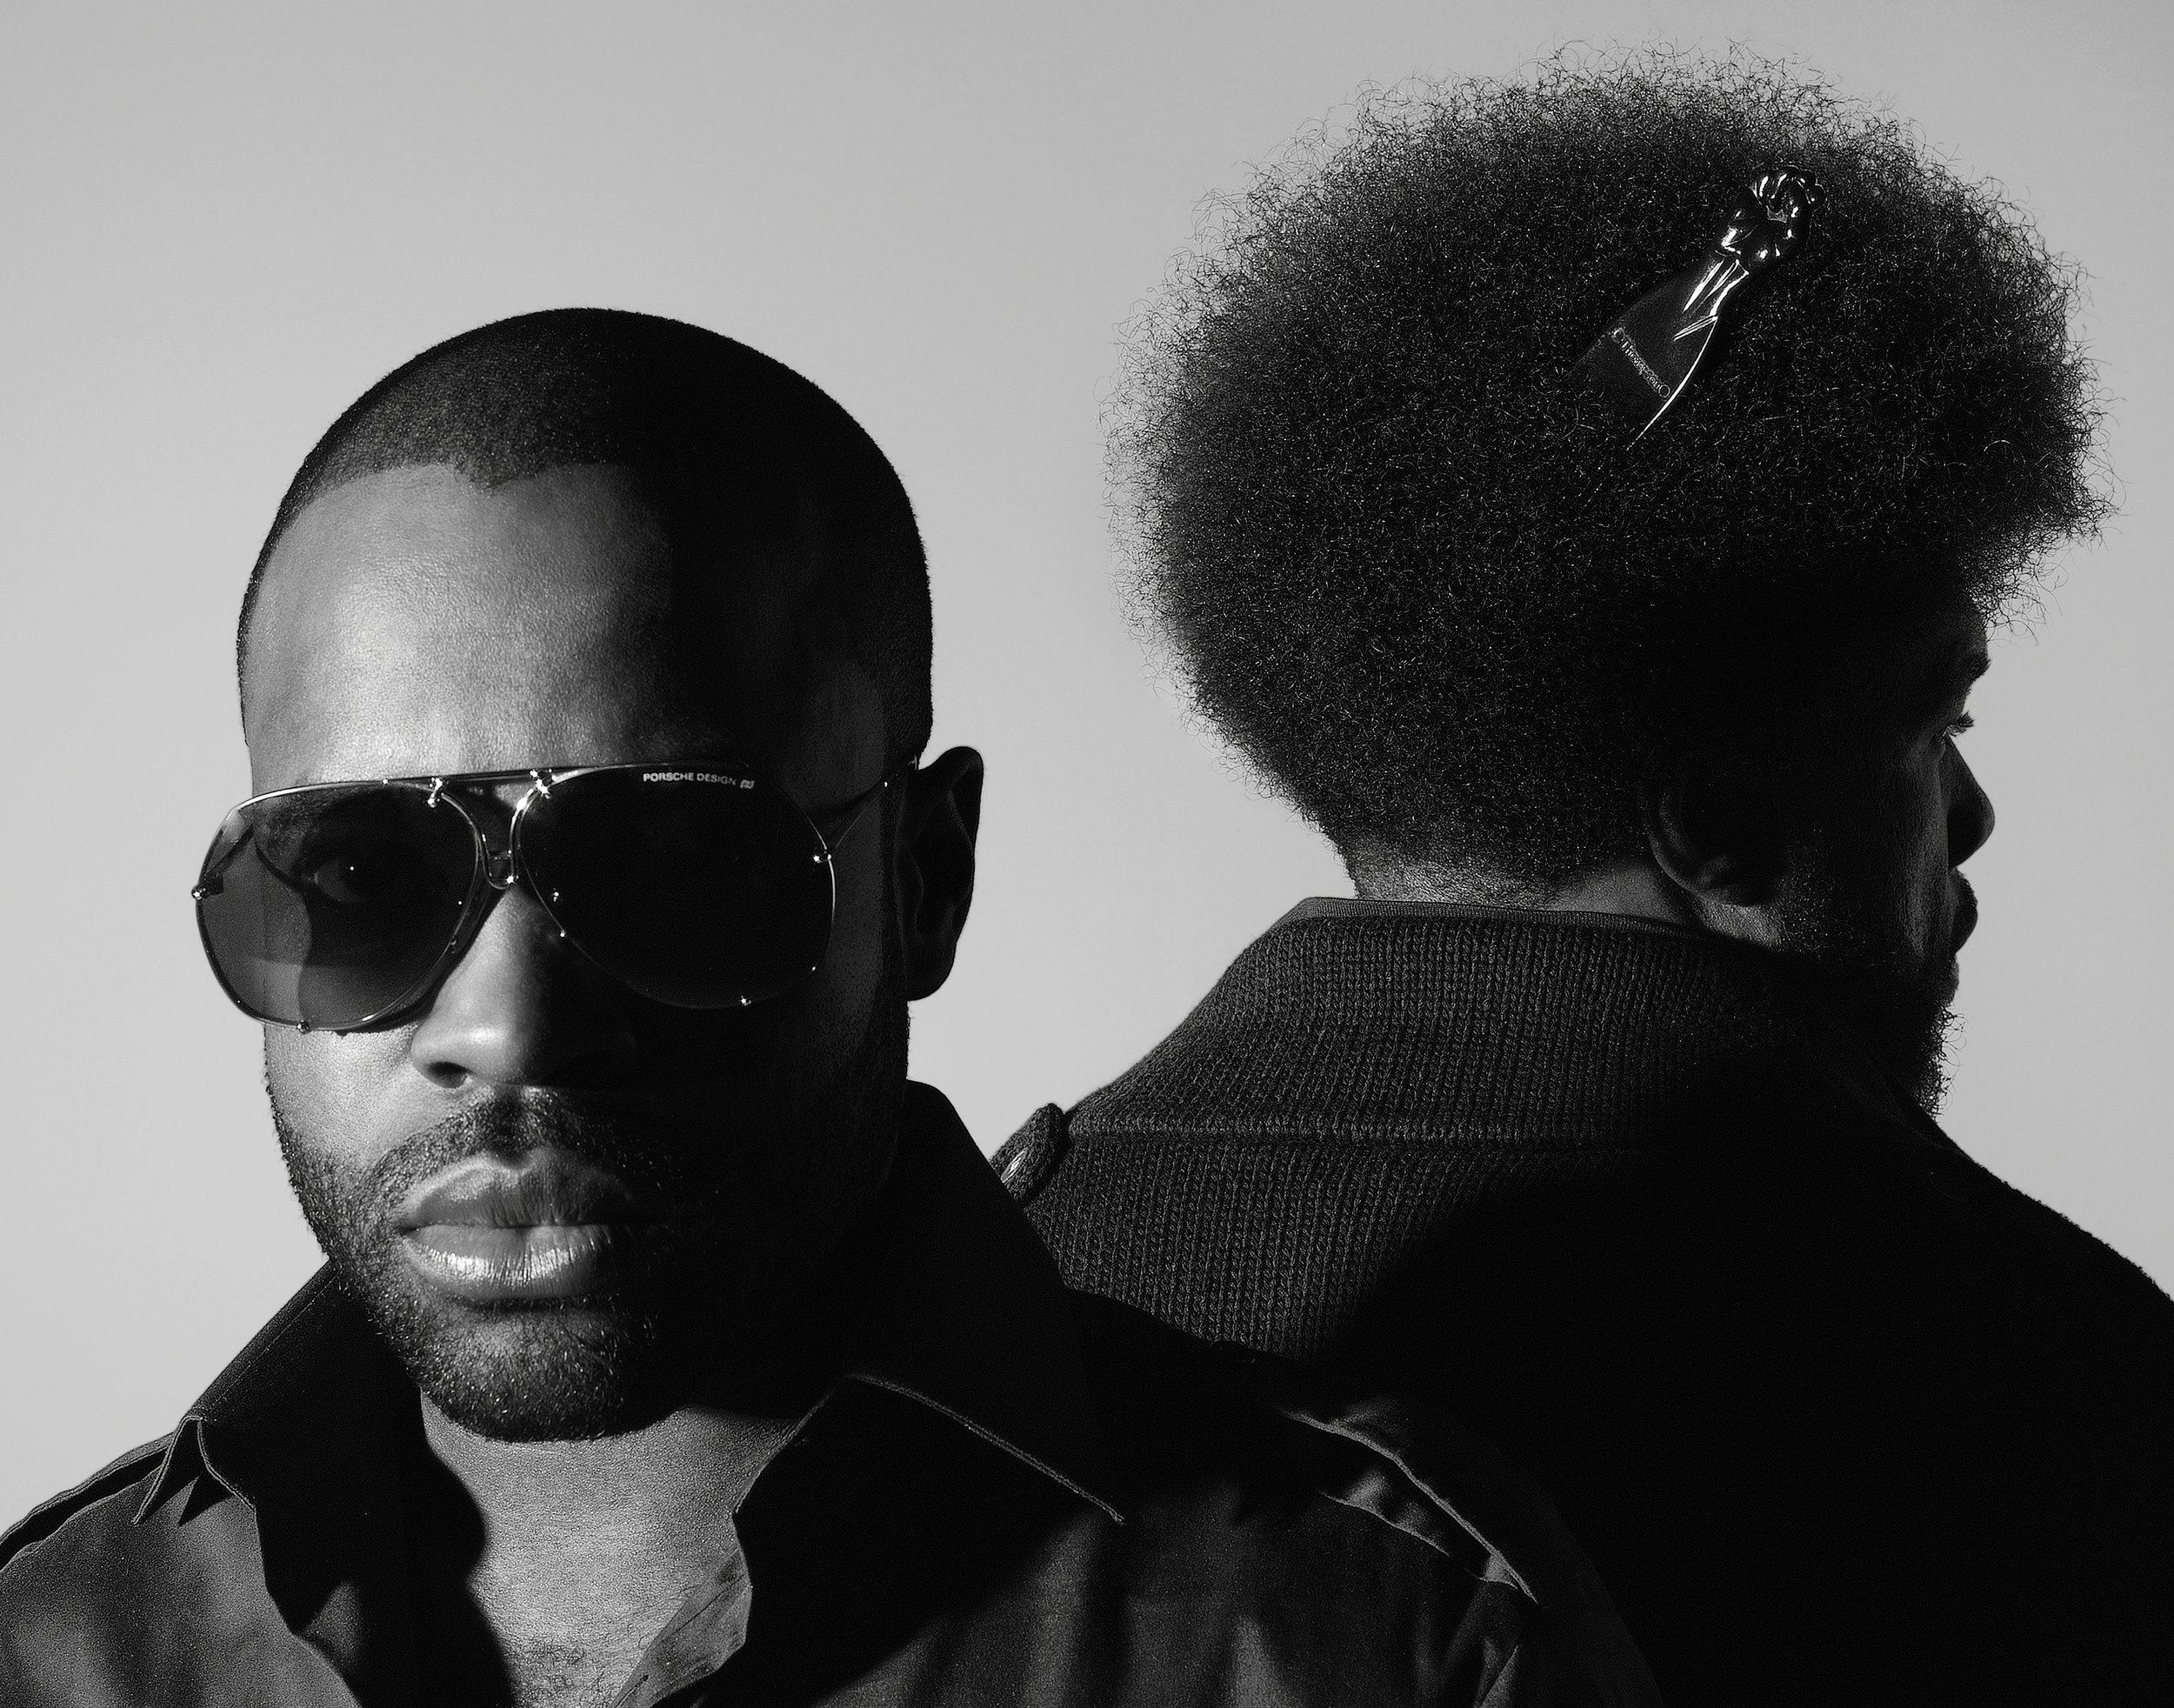 The Roots _Chago & Brian Photographers_ Rebecca Pietri Stylist_Rebecca Pietri Art Director_ Black Thought _ Questlove_ .jpg